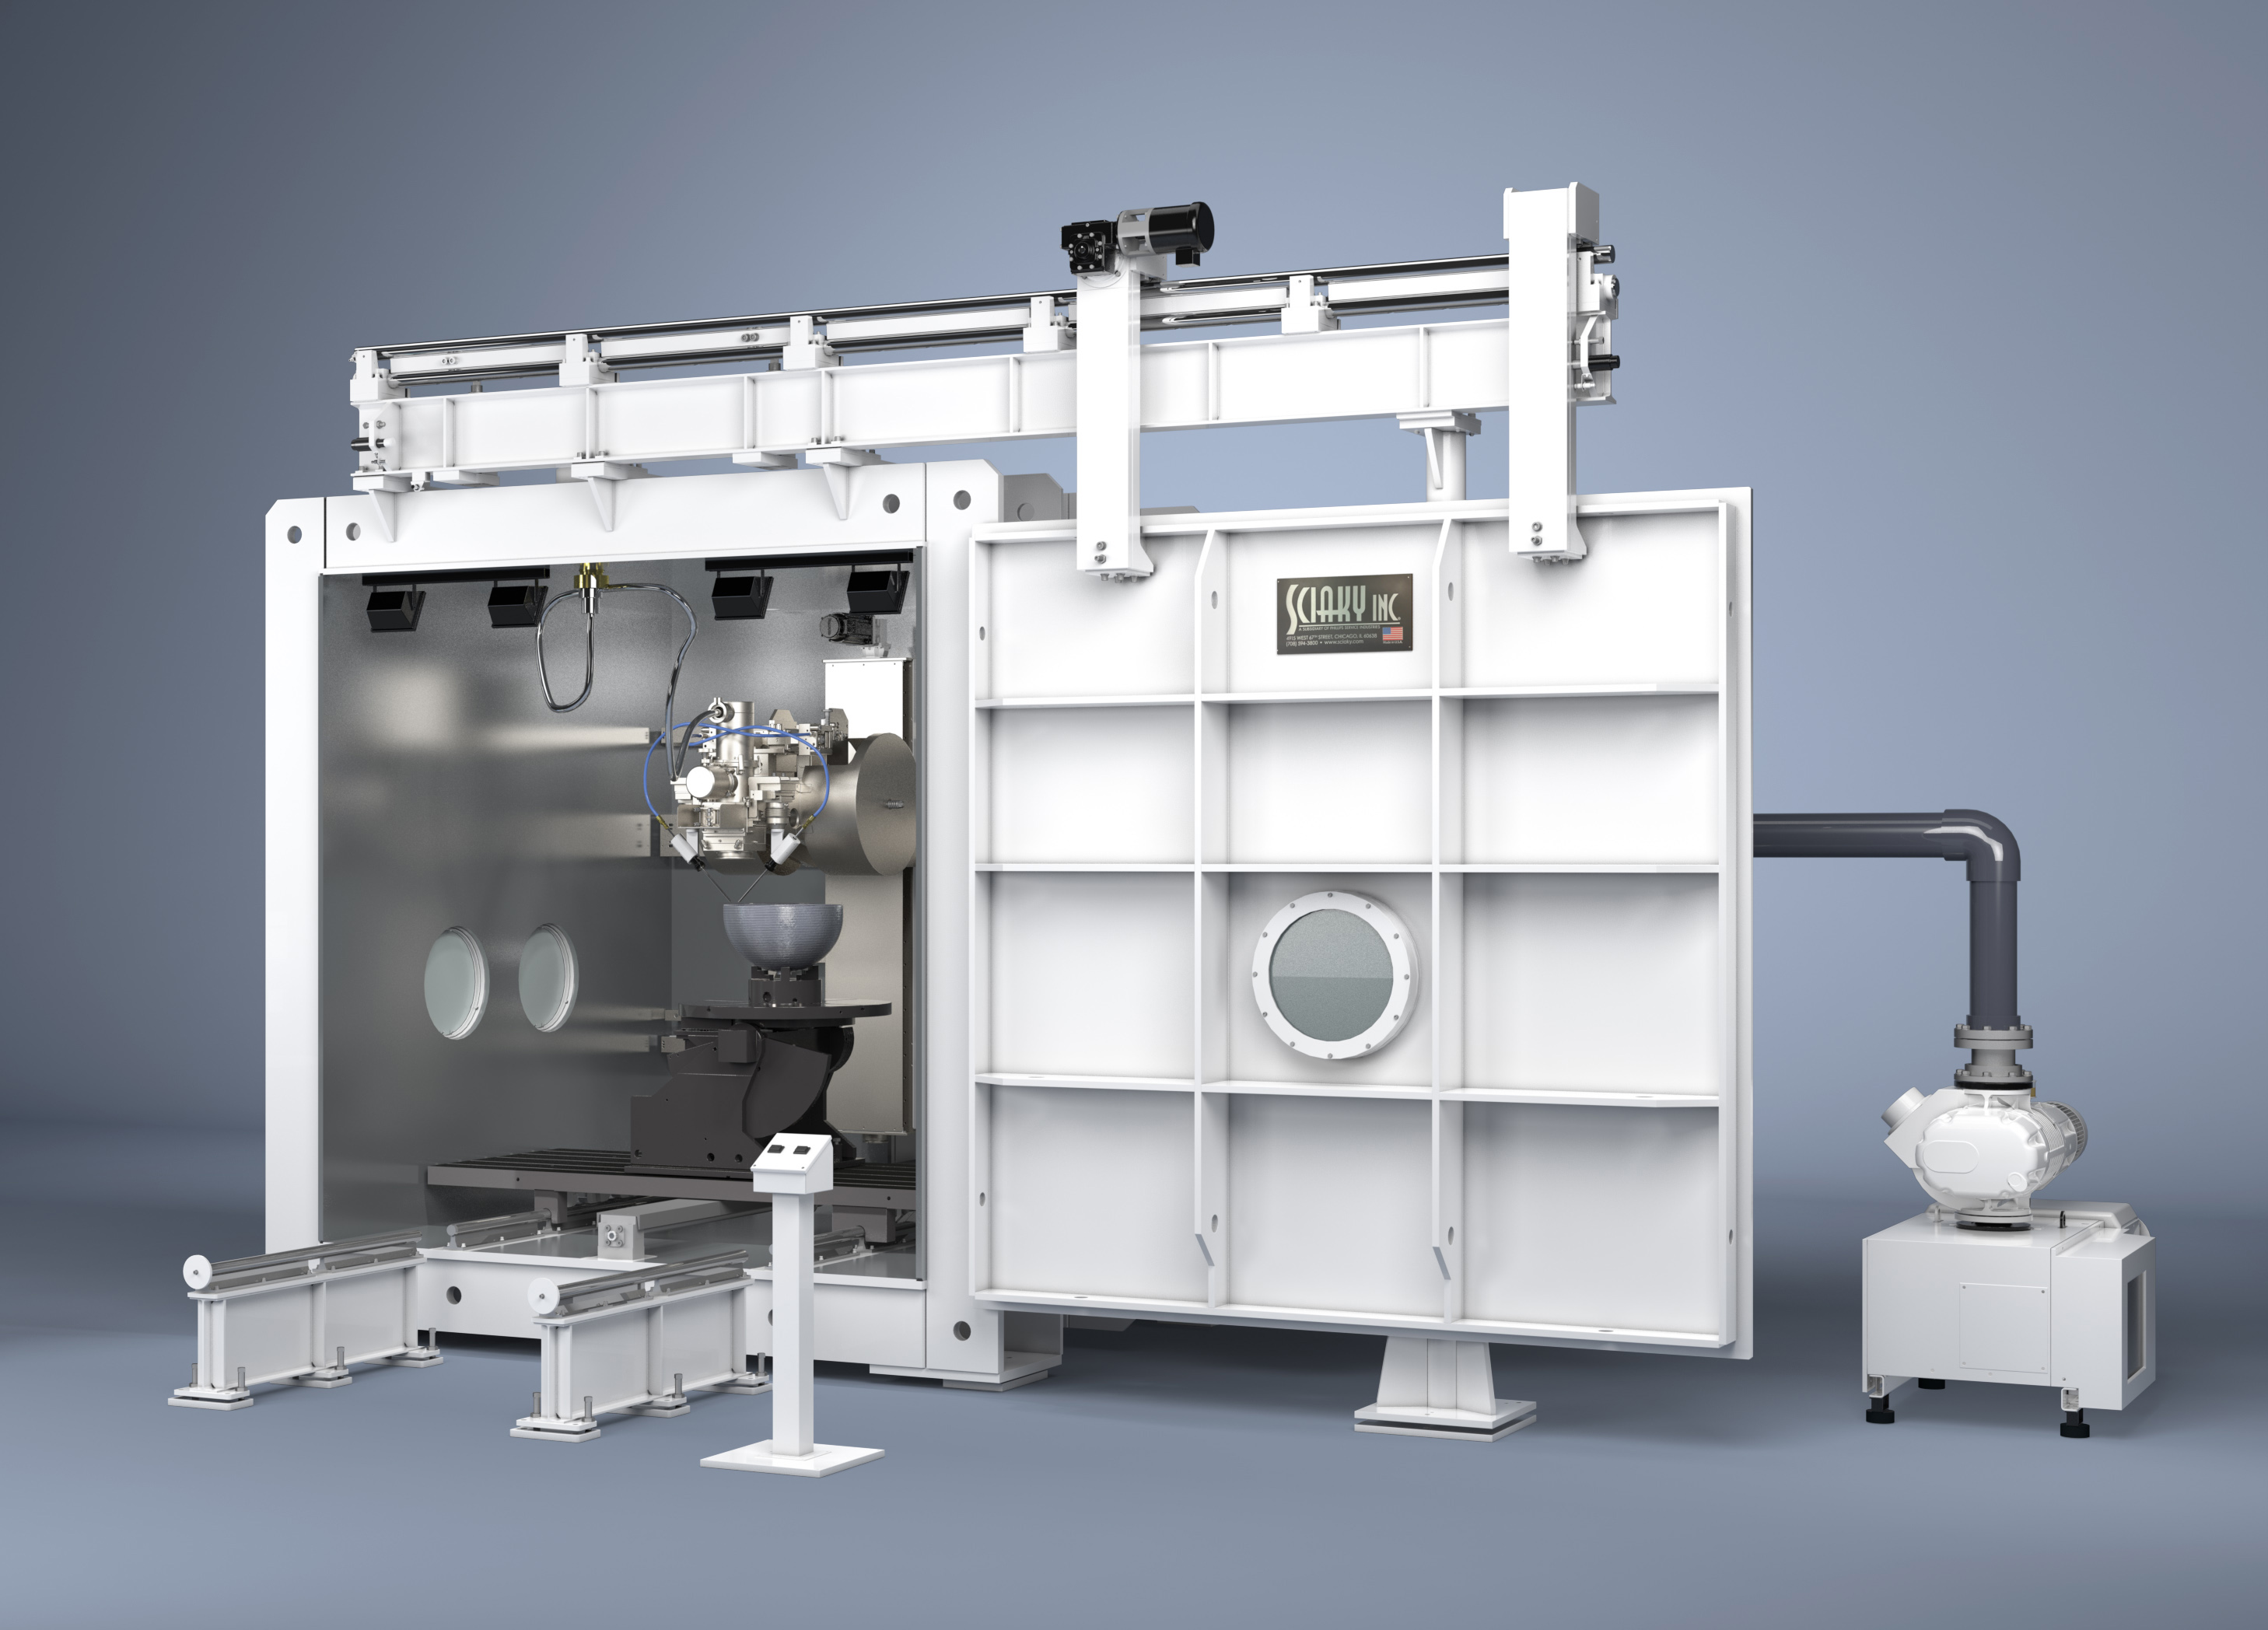 EBAM VX-110 forge-like additive manufacturing